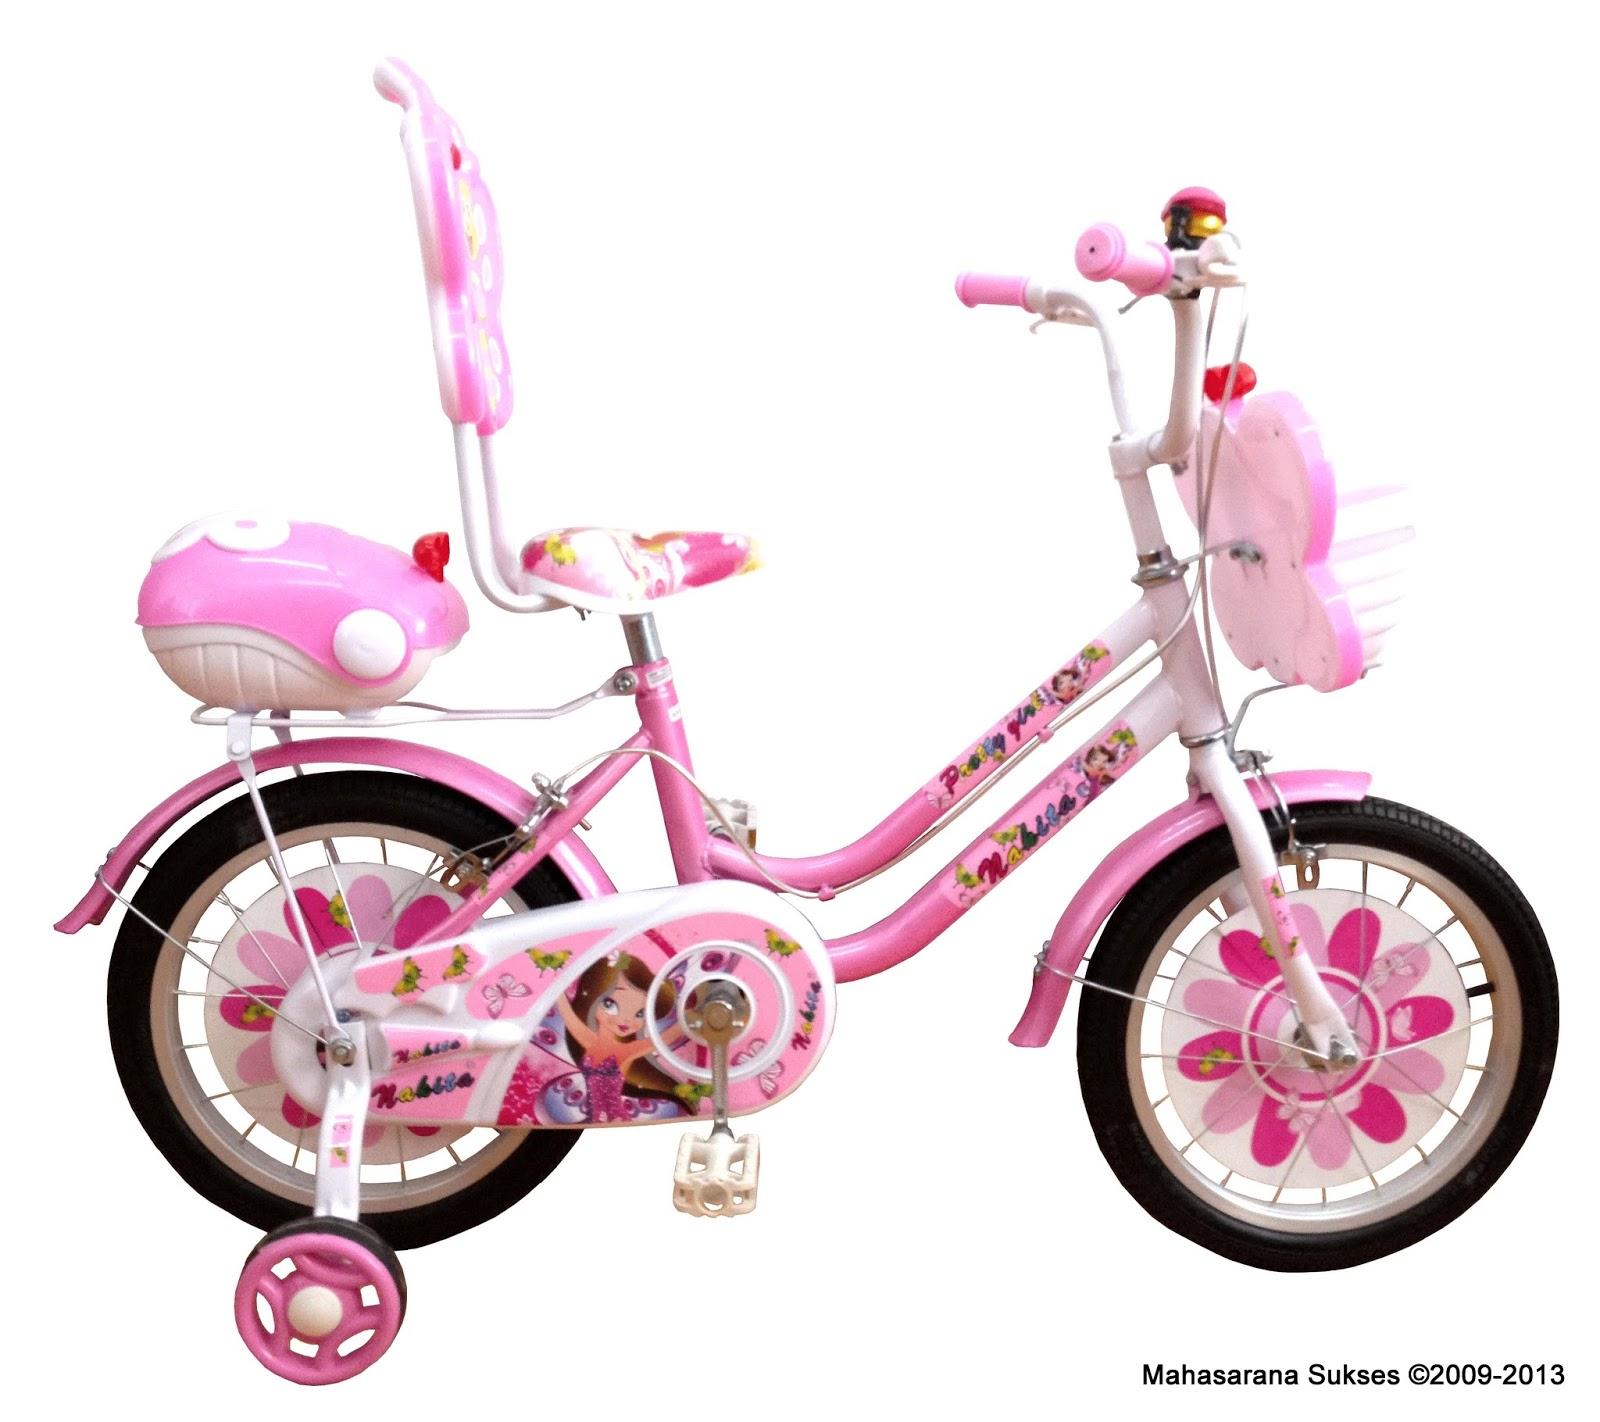 Jenis Mainan Anak 6 Bulan - Dhian Toys